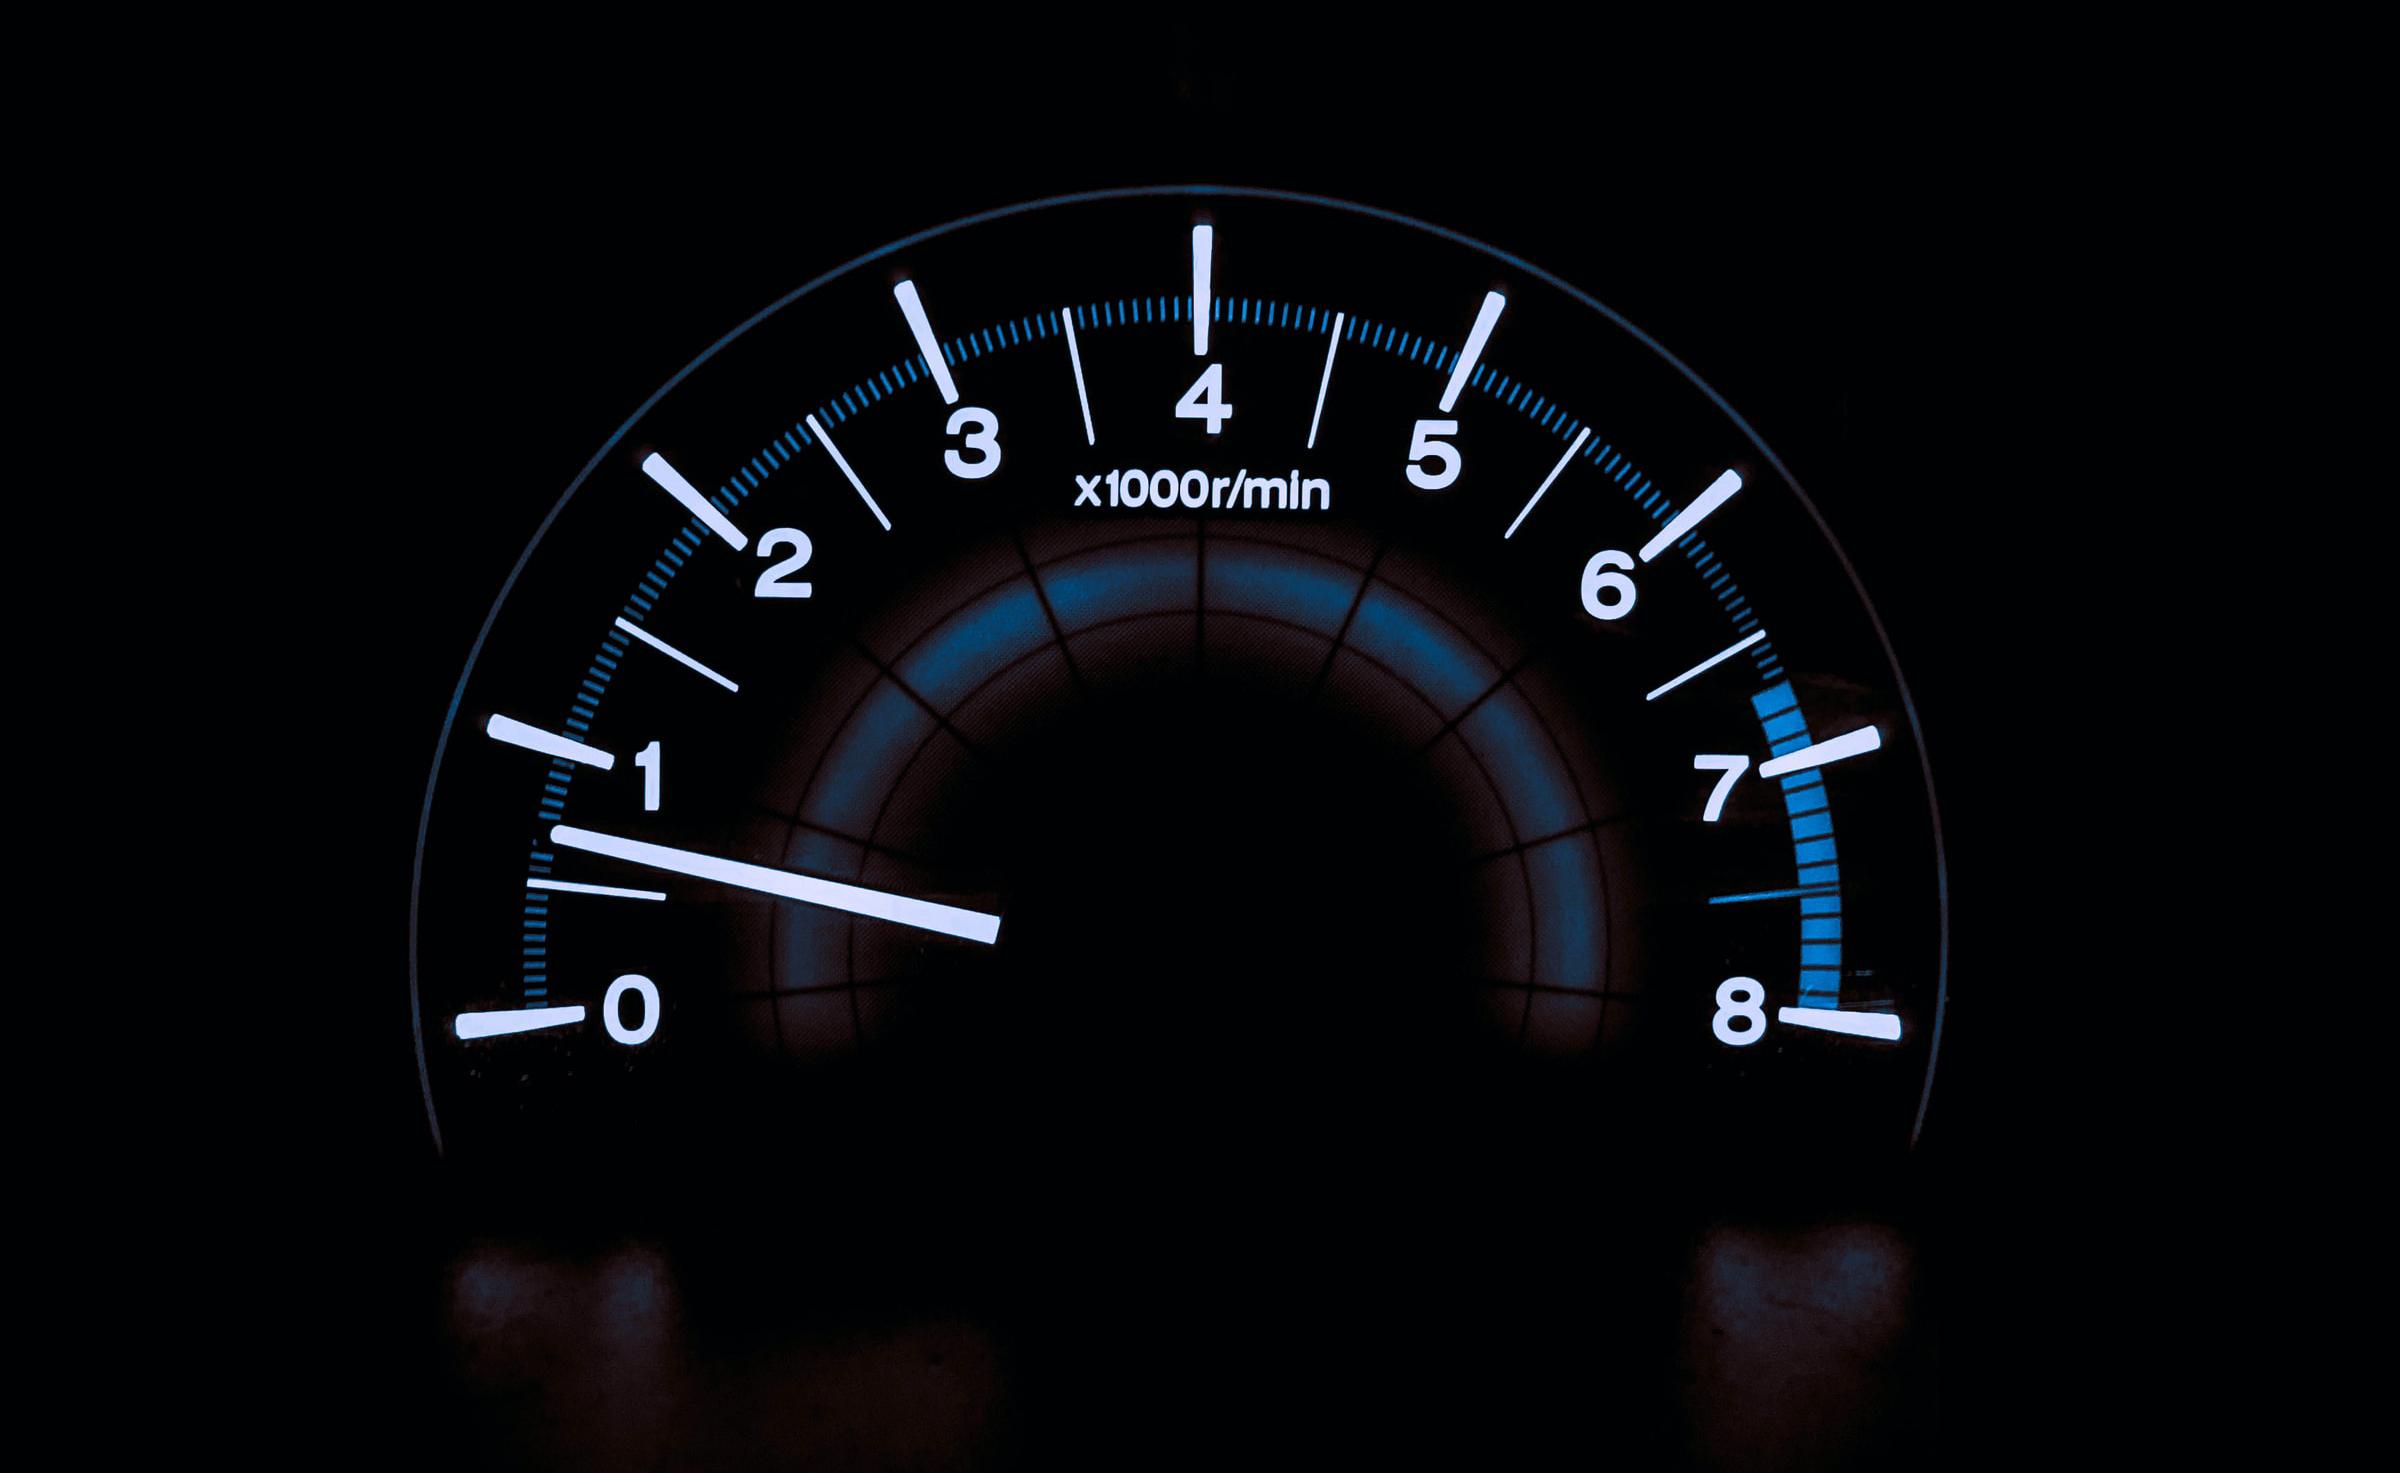 FCC wants the public to help measure actual broadband speeds